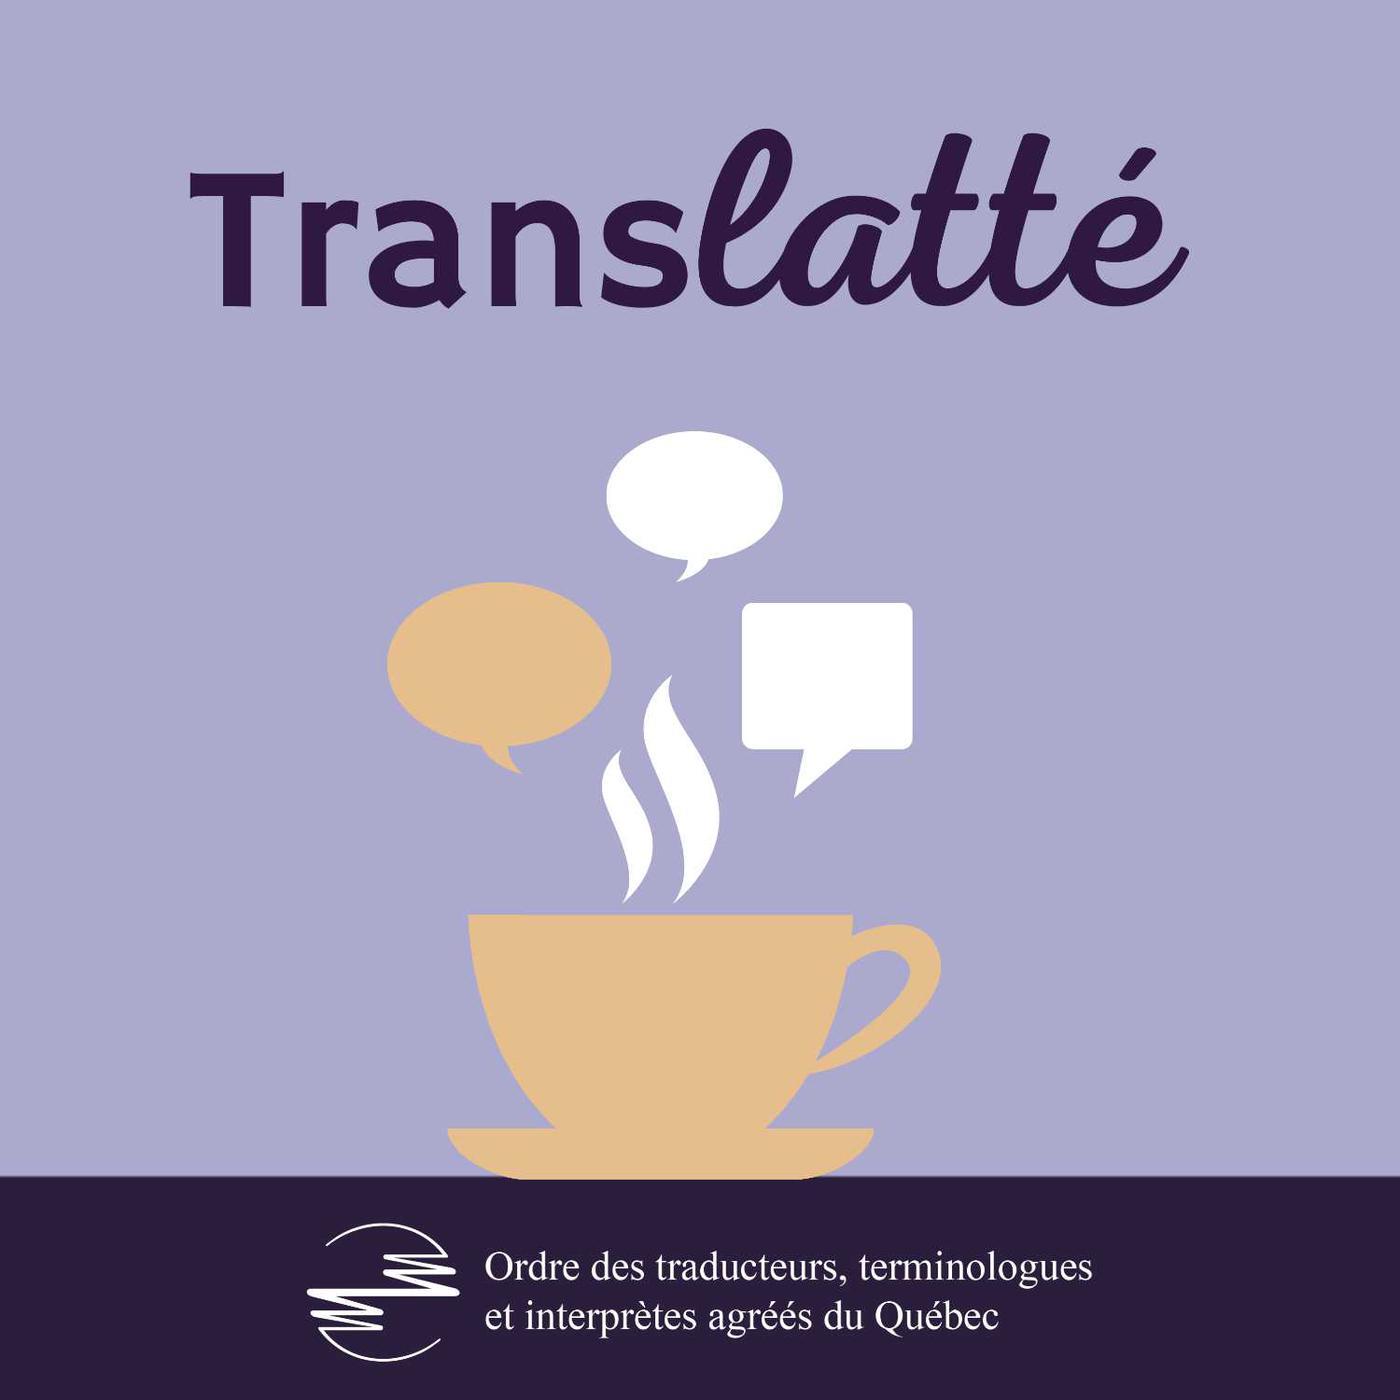 Translatté